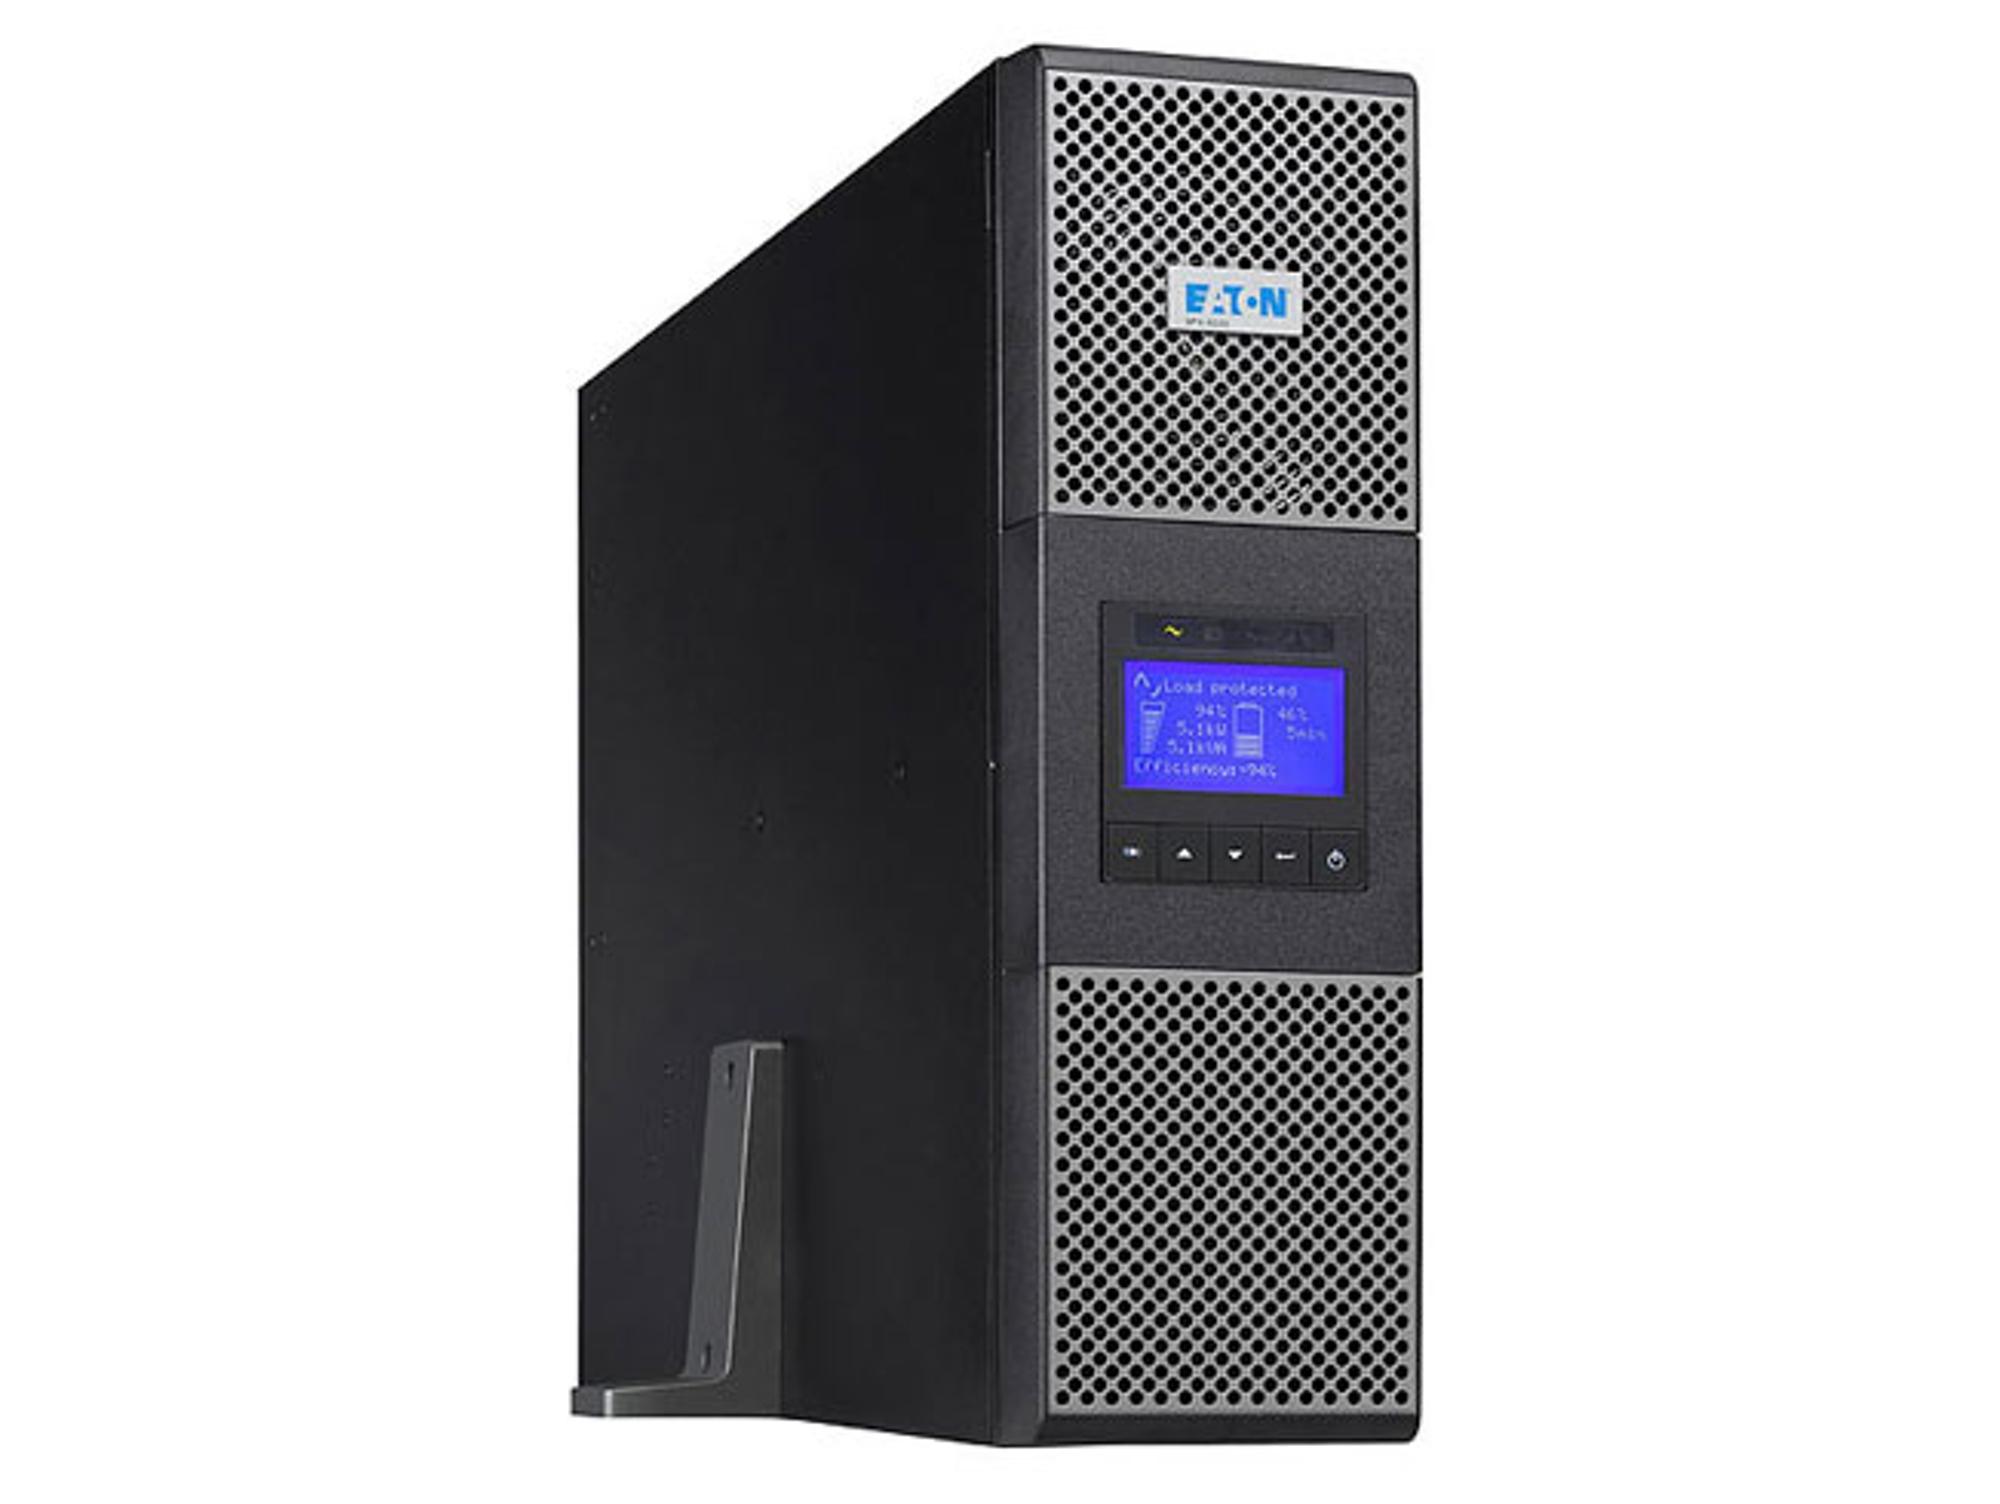 Ups EATON 9PX 5000i HotSwap 5000VA 4AC outlets Torre